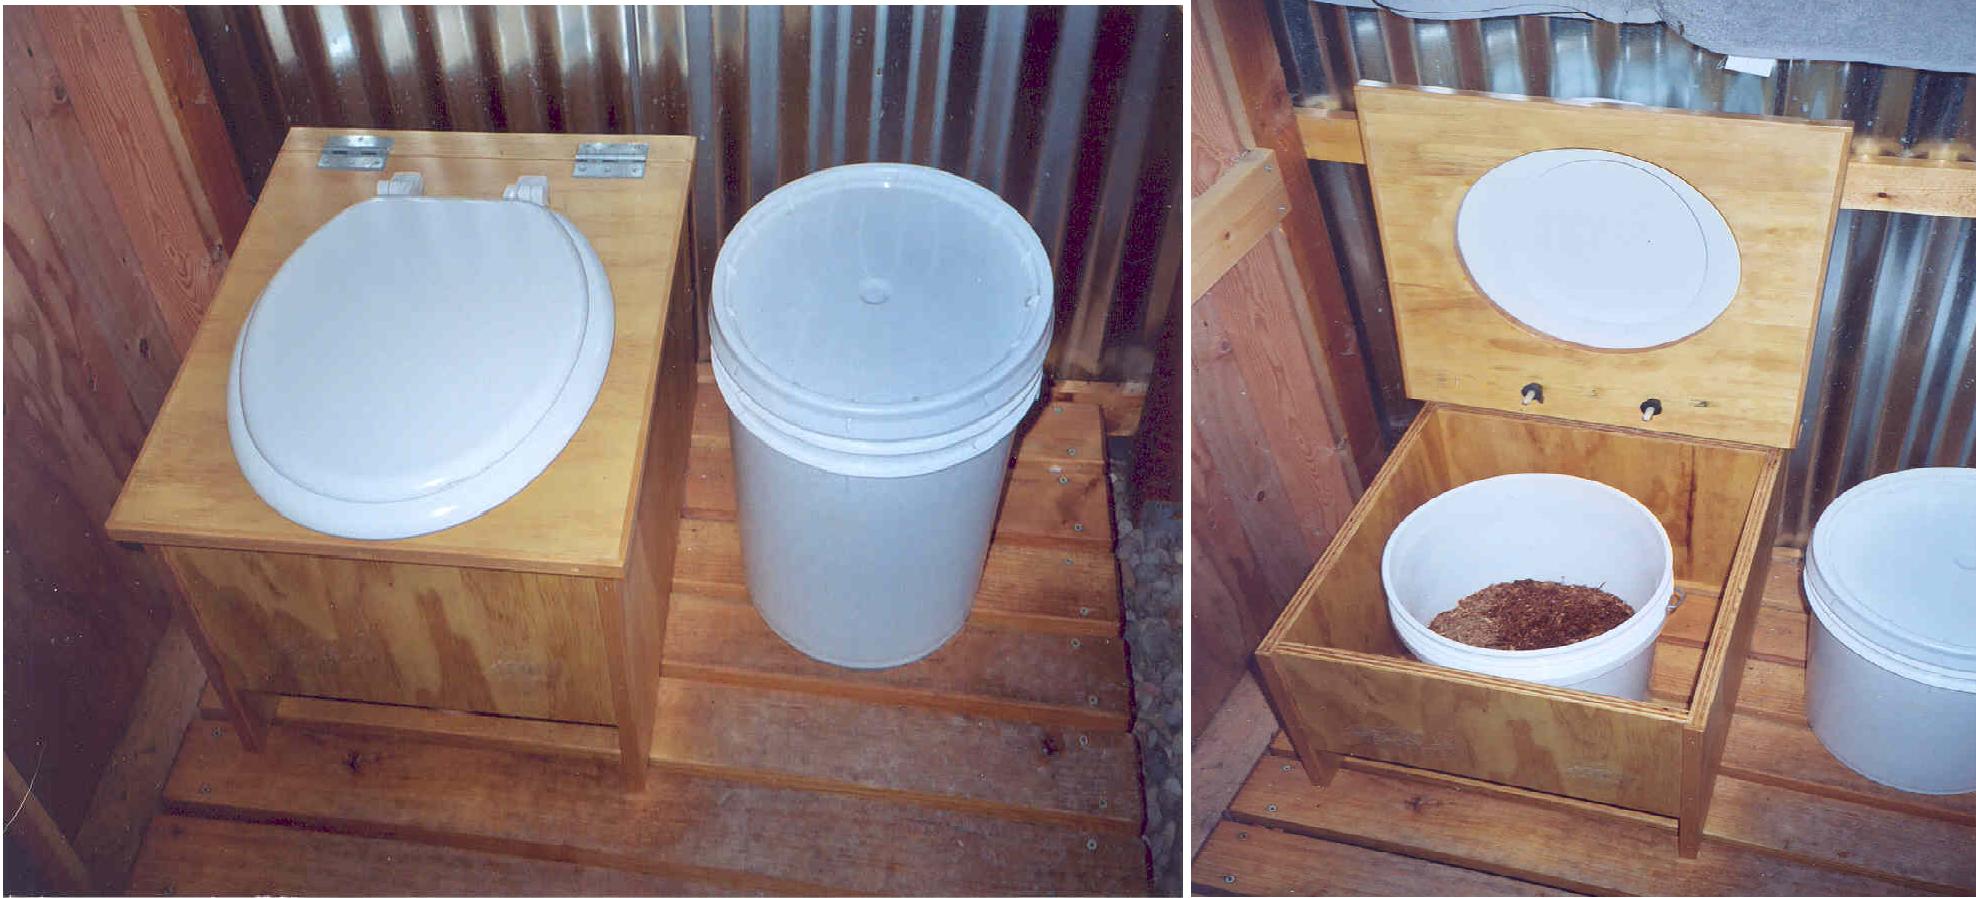 Как сделать туалет на даче своими руками фото чертеж